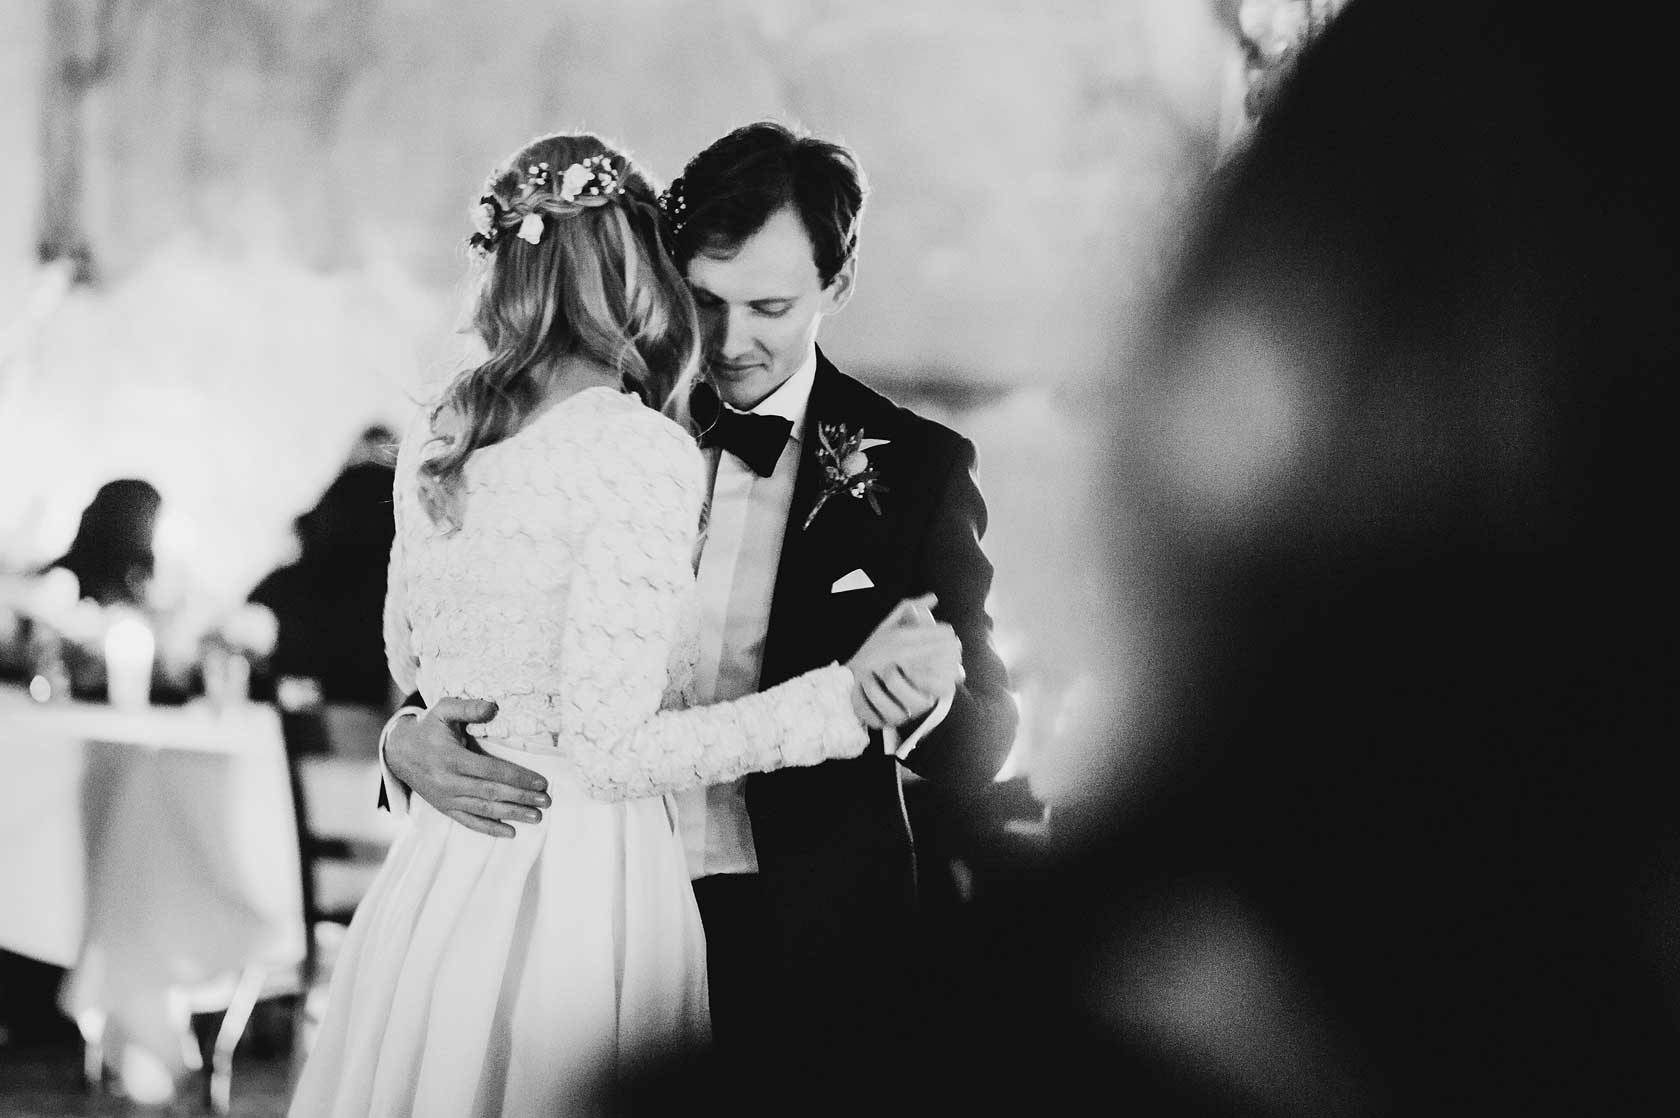 London Winter Wedding Photography